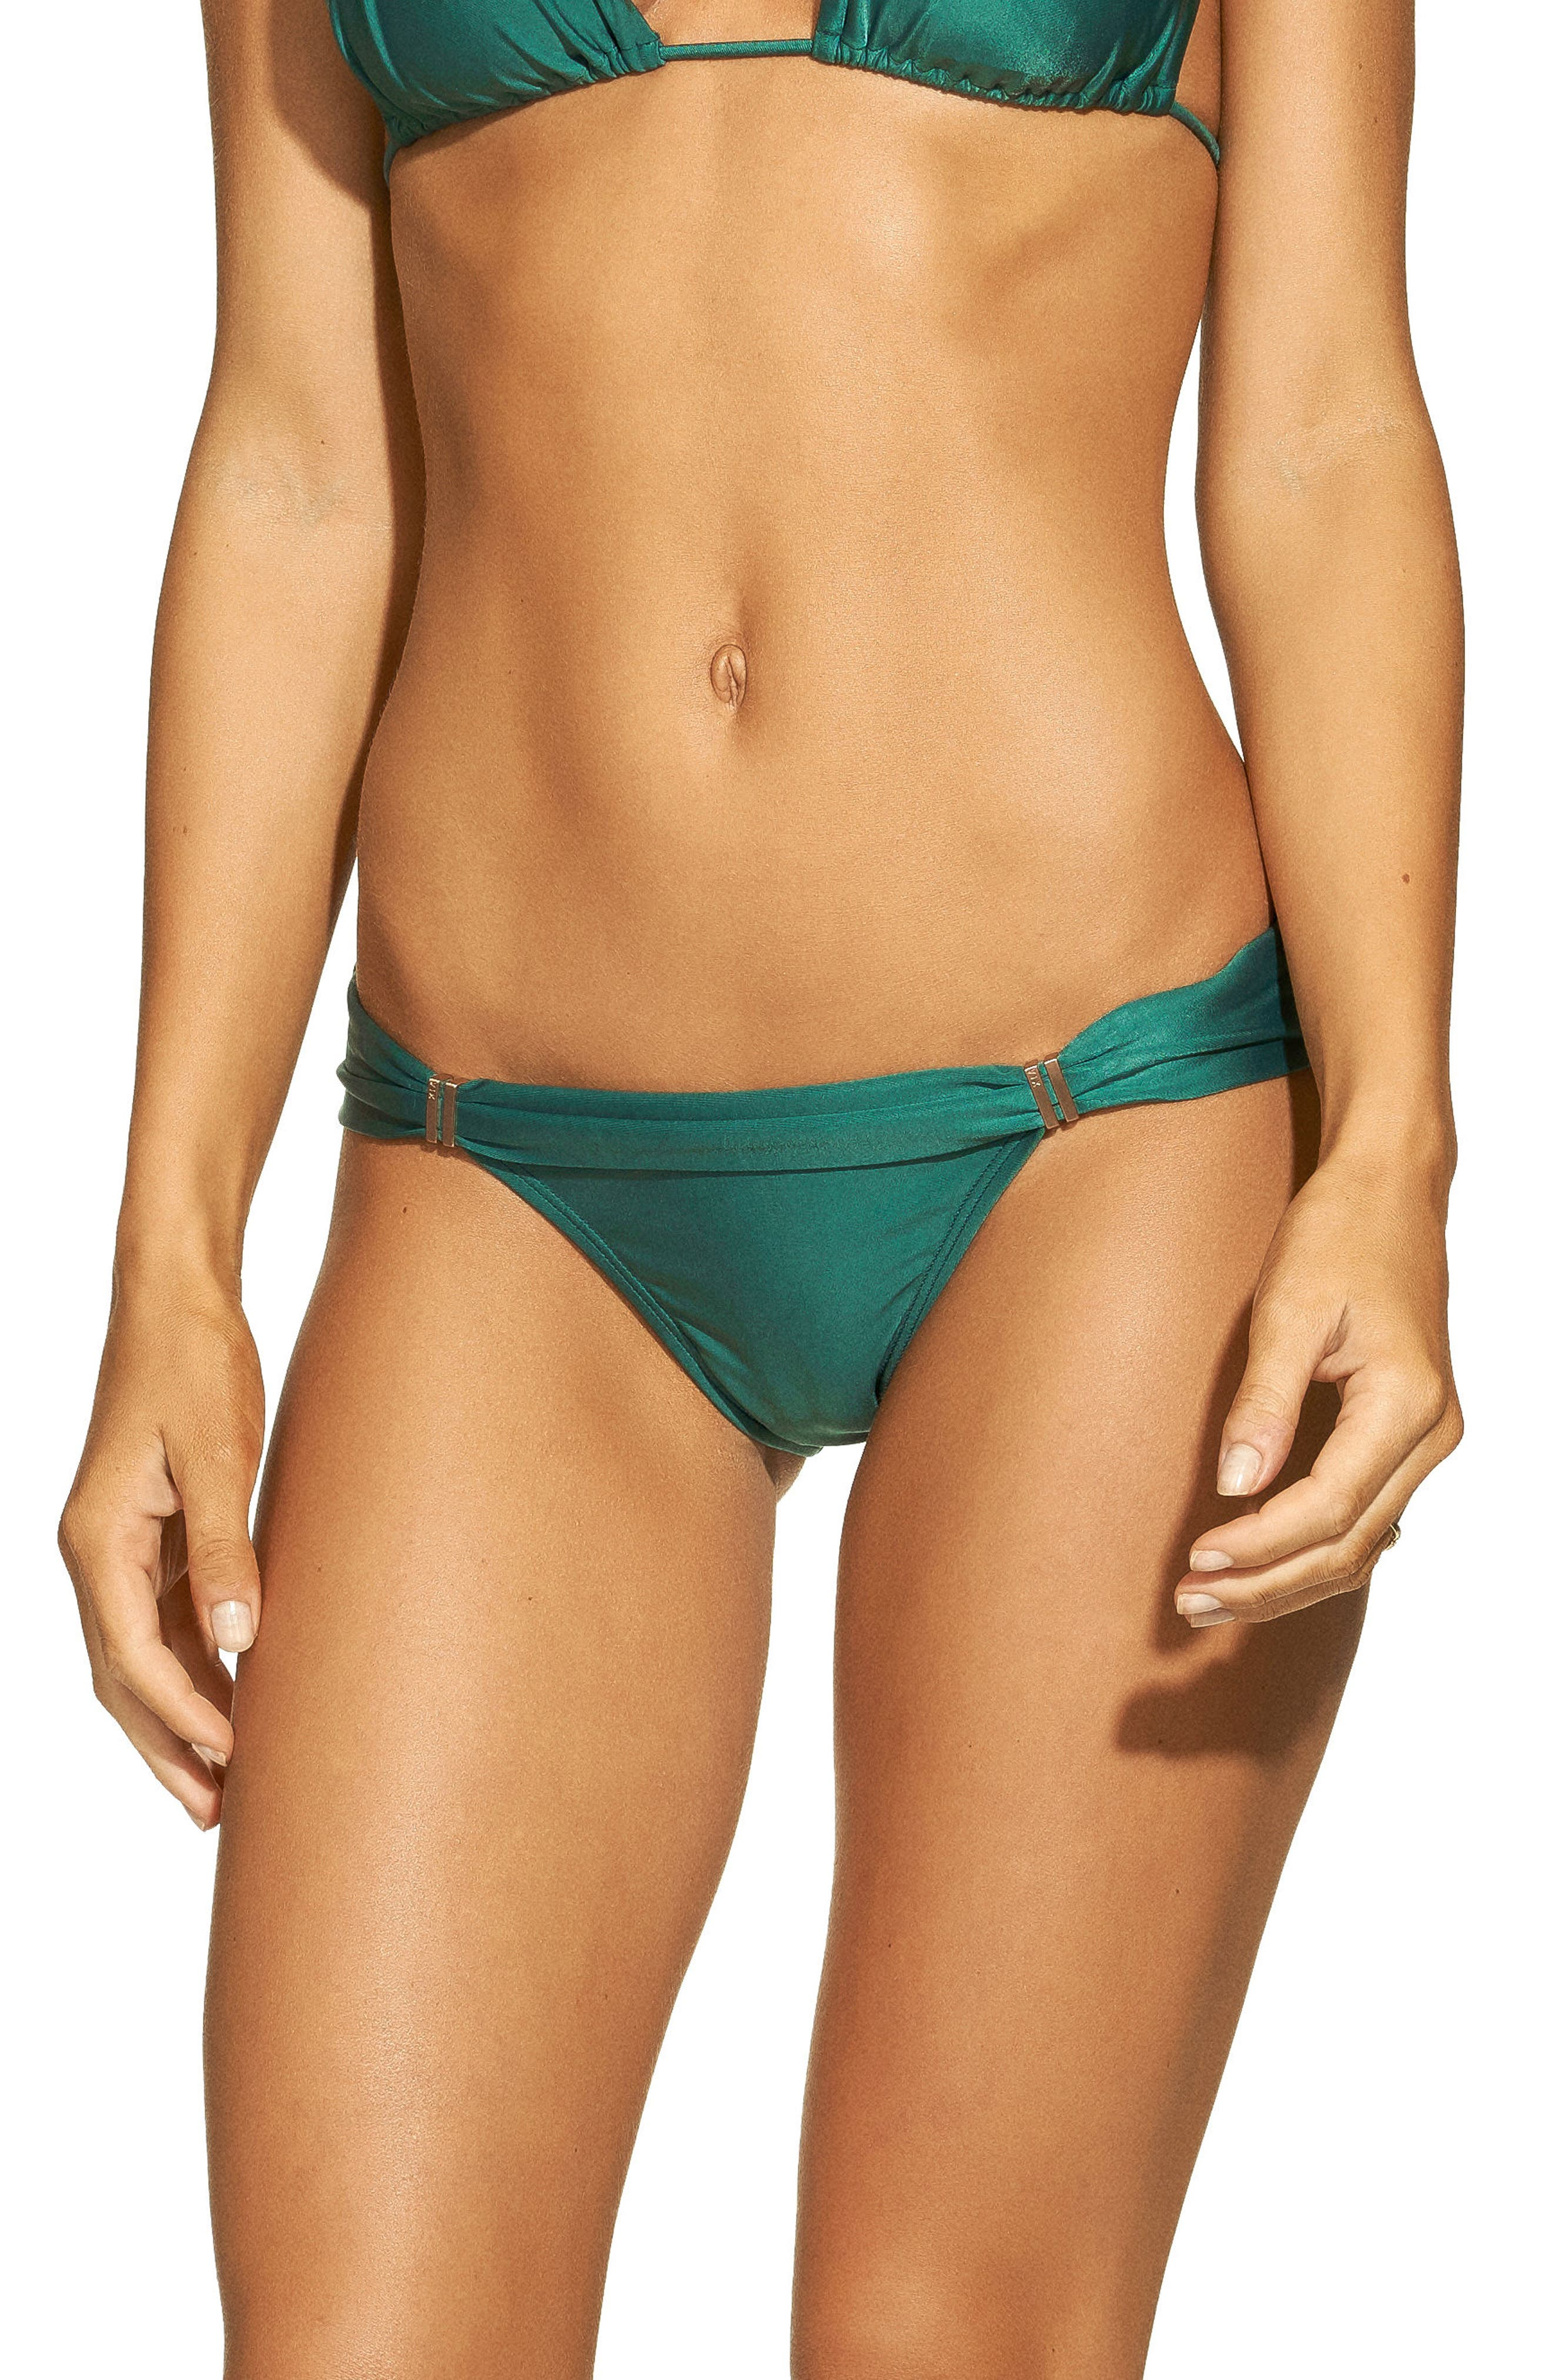 Jasper Bia Bikini Bottoms,                         Main,                         color, GREEN